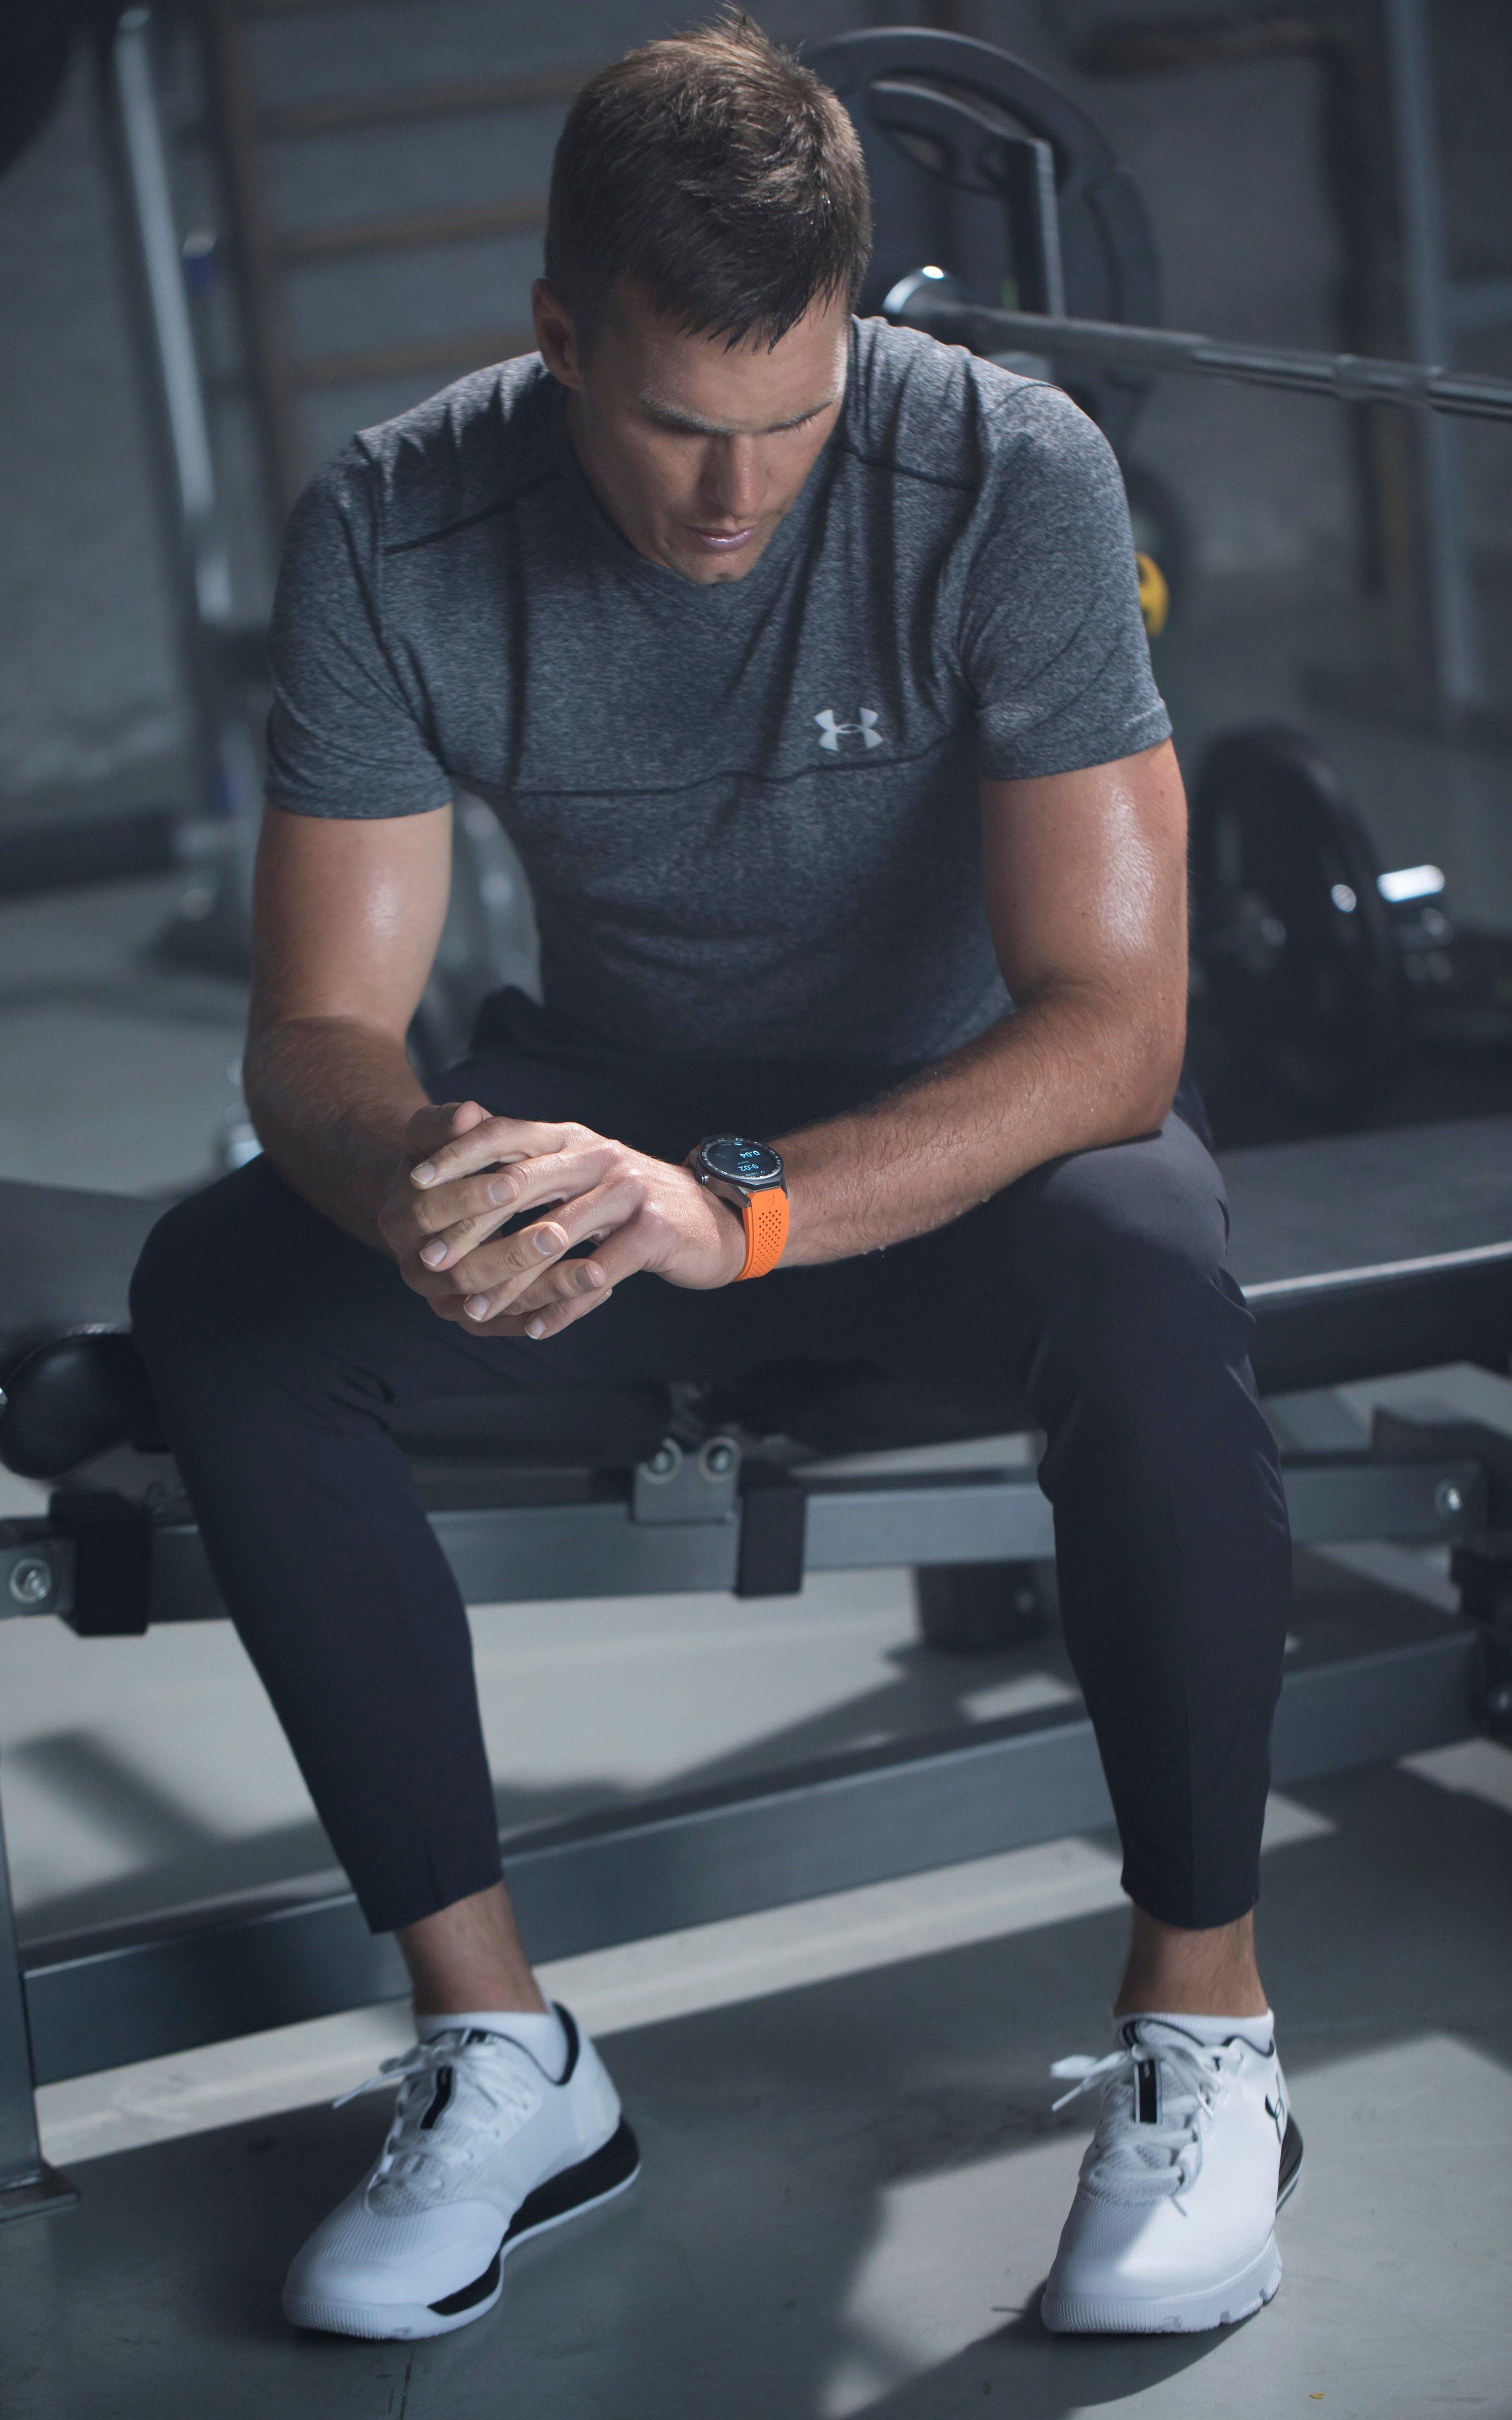 Tom Brady Workout Routine Diet Plan And Body